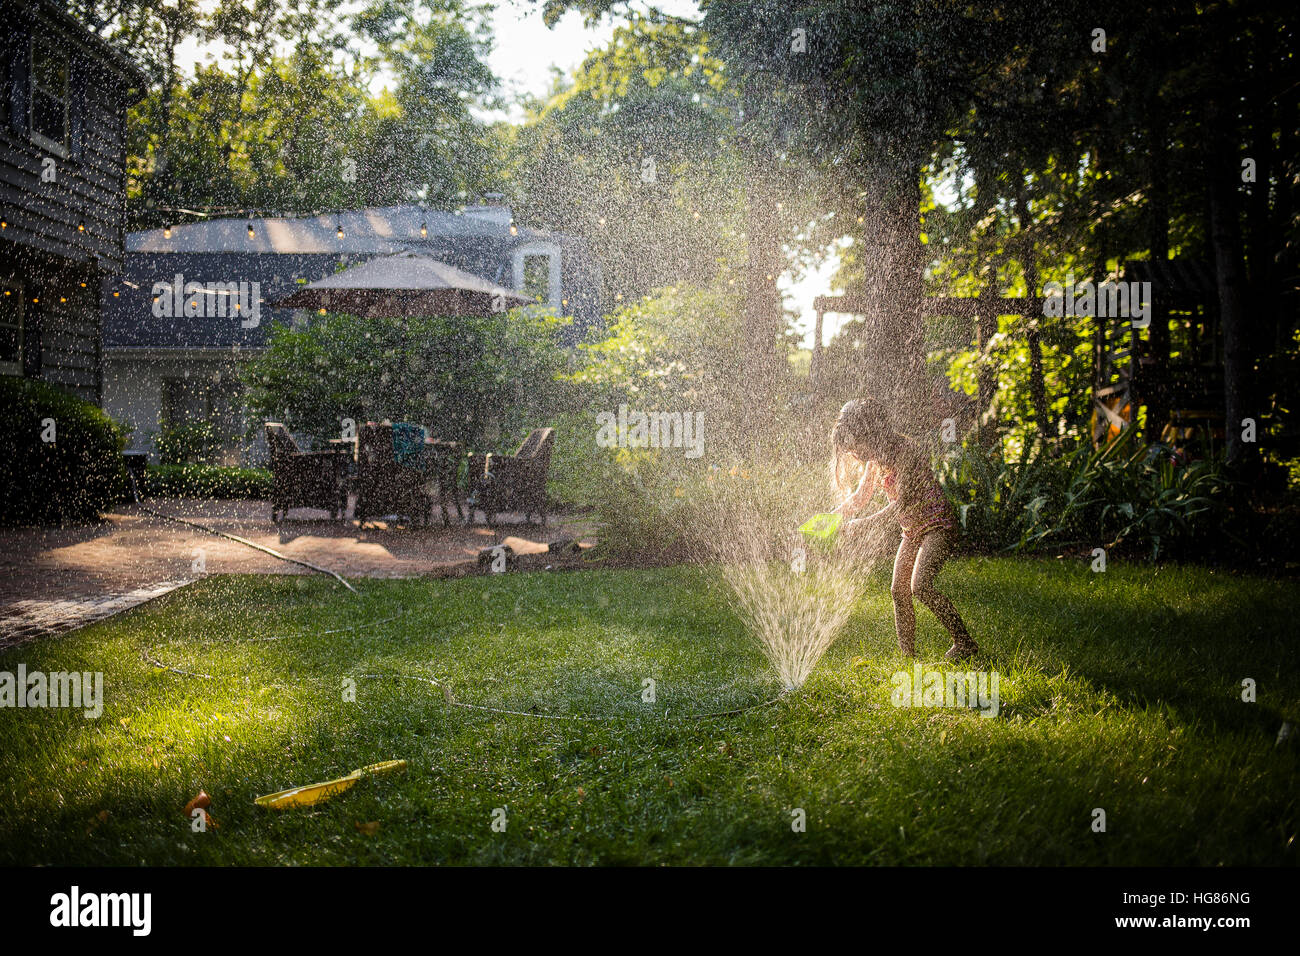 Happy girl in swimwear playing with sprinkler in backyard - Stock Image